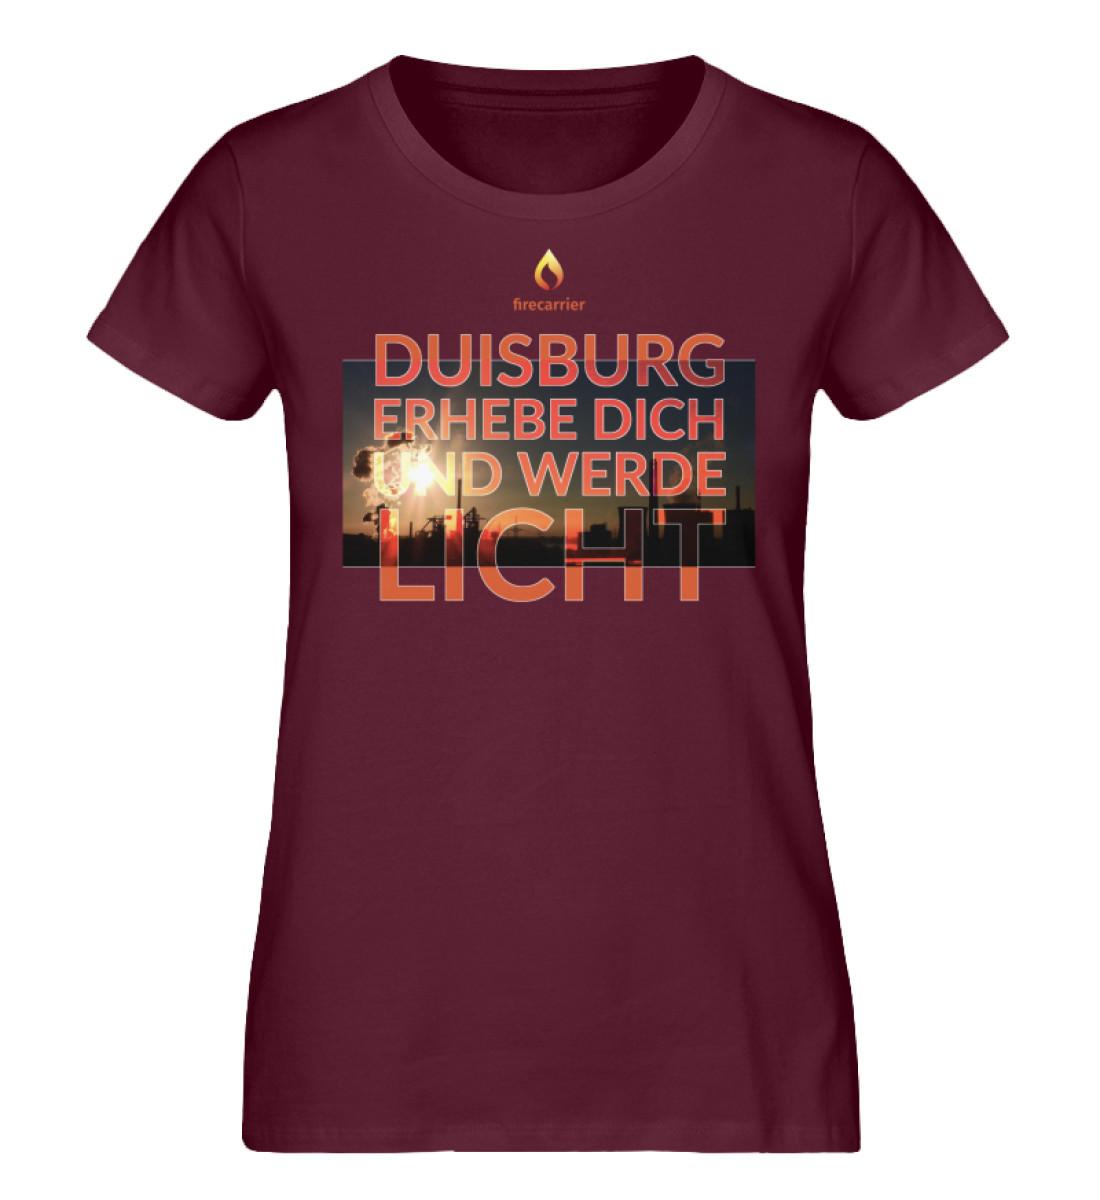 duisburg - Damen Premium Organic Shirt-839